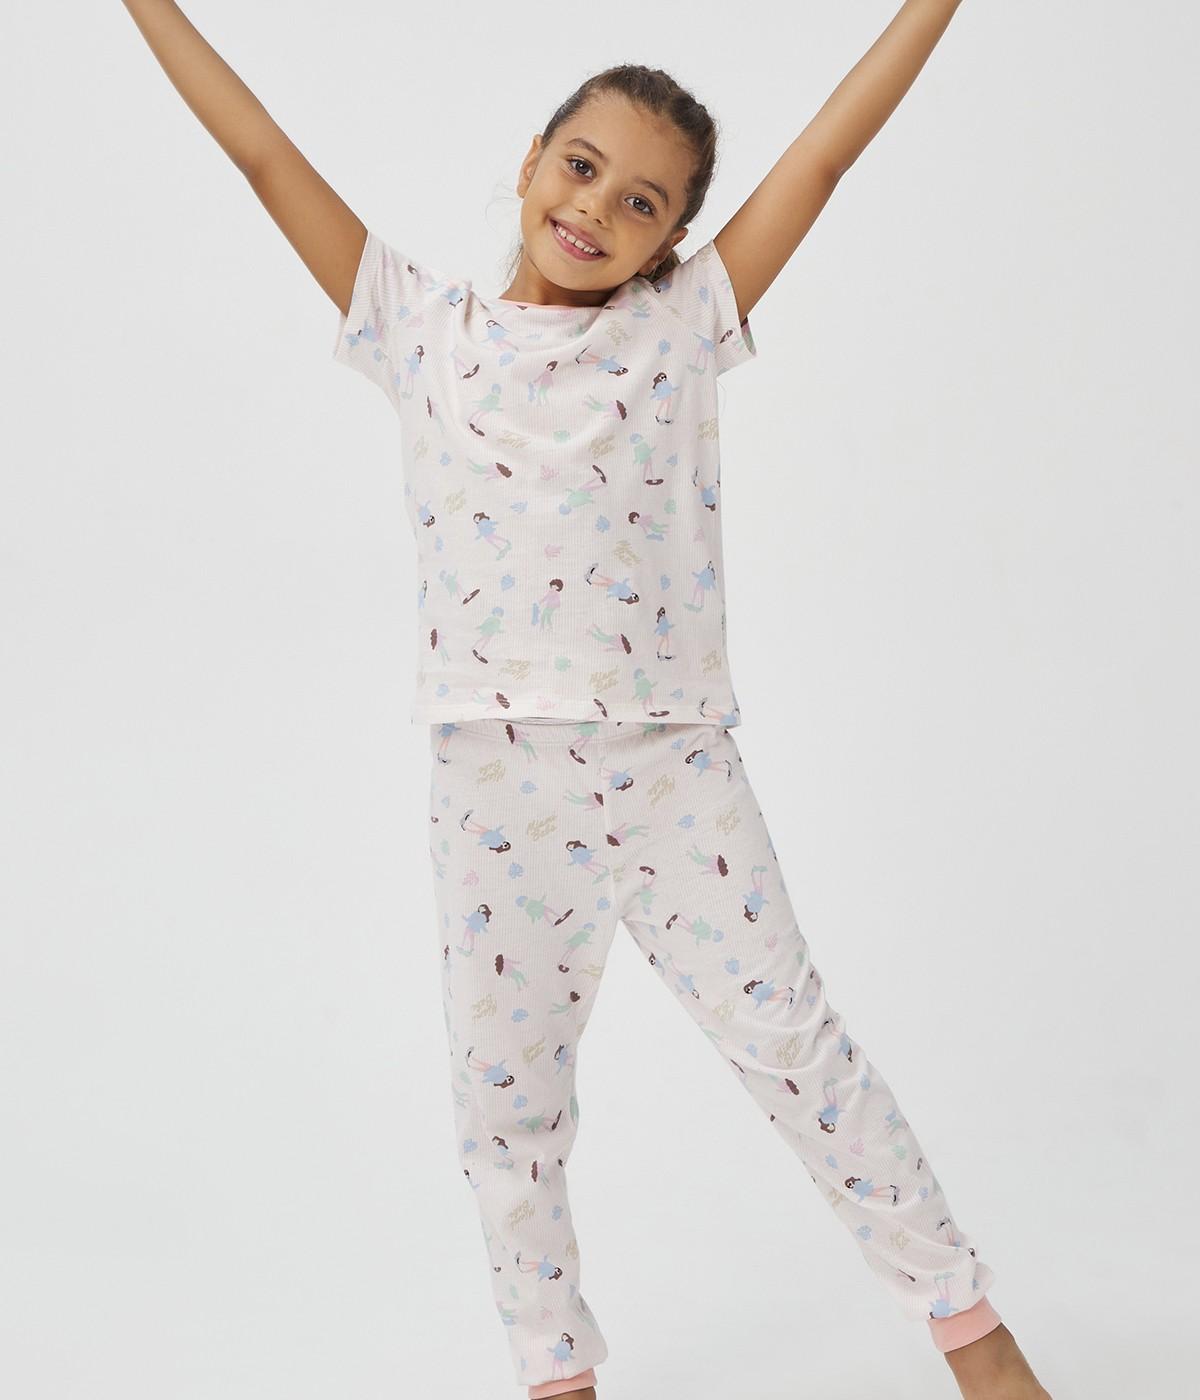 Feti?e Babe Miamı 4Buc Set Pijama